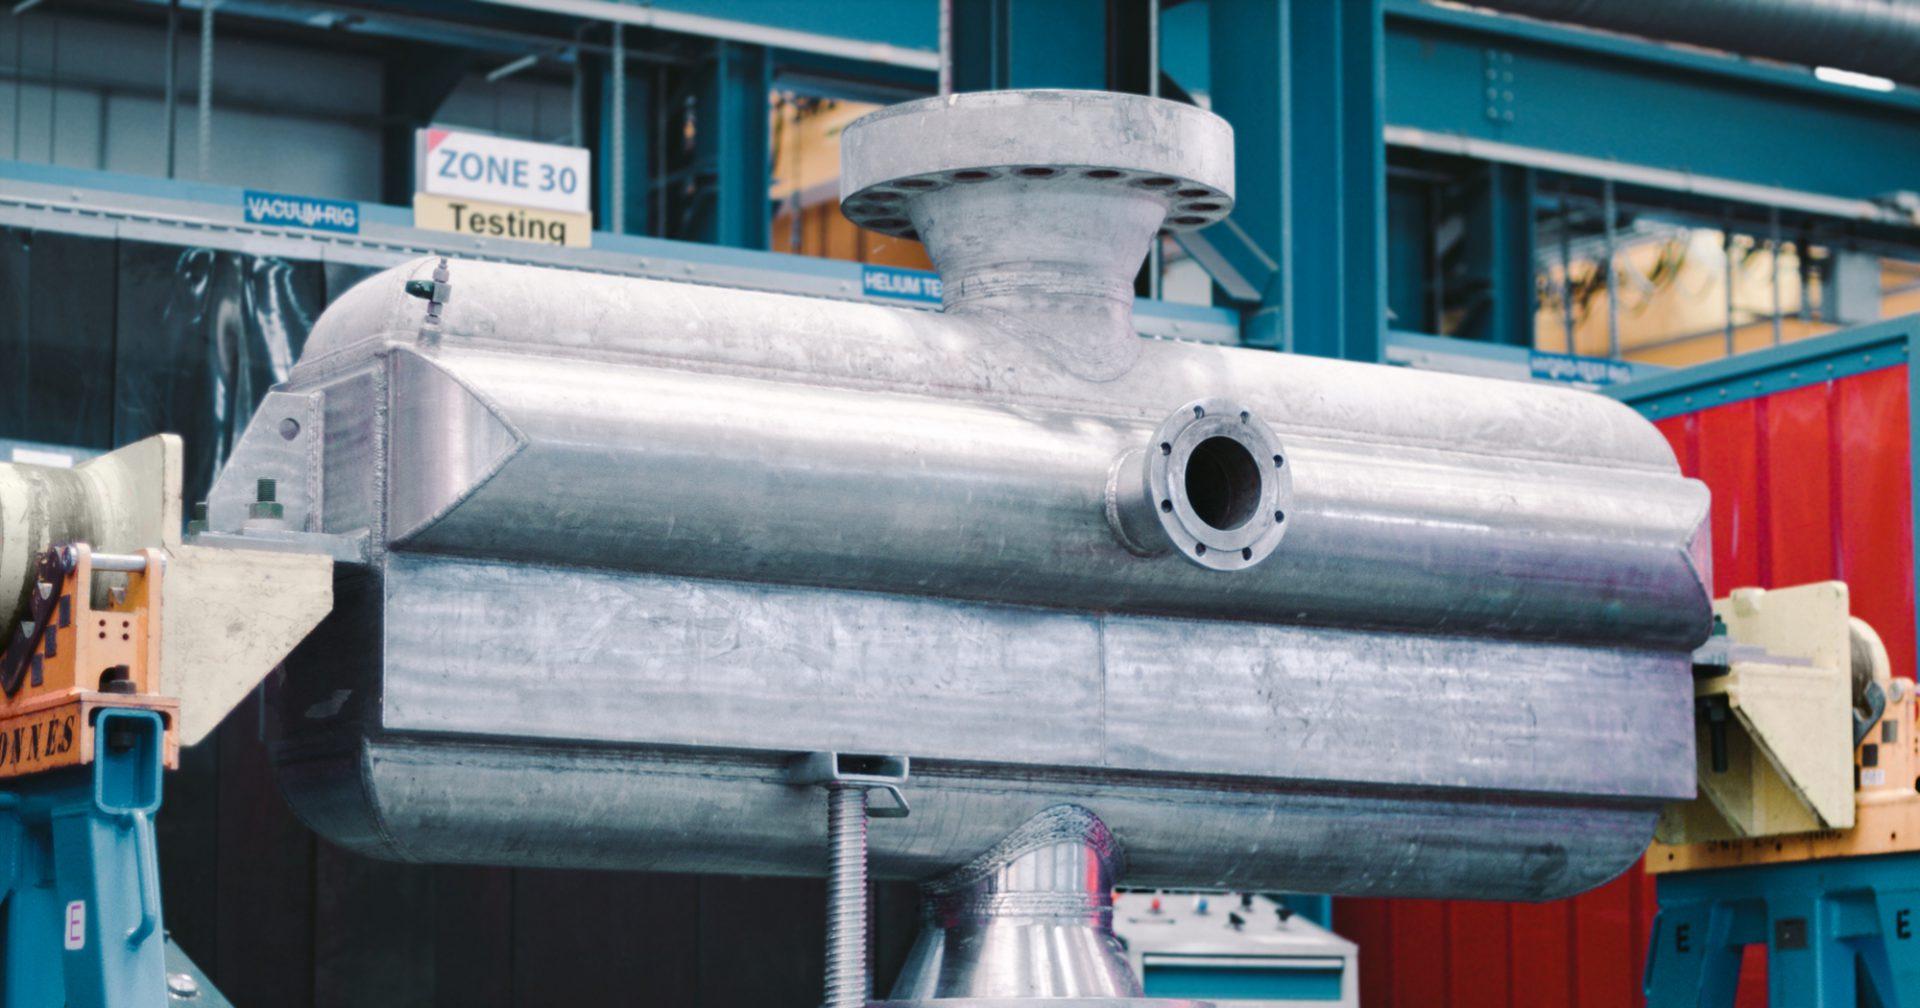 Printed Circuit Heat Exchangers  HighIntegrity Equipment  Heatric